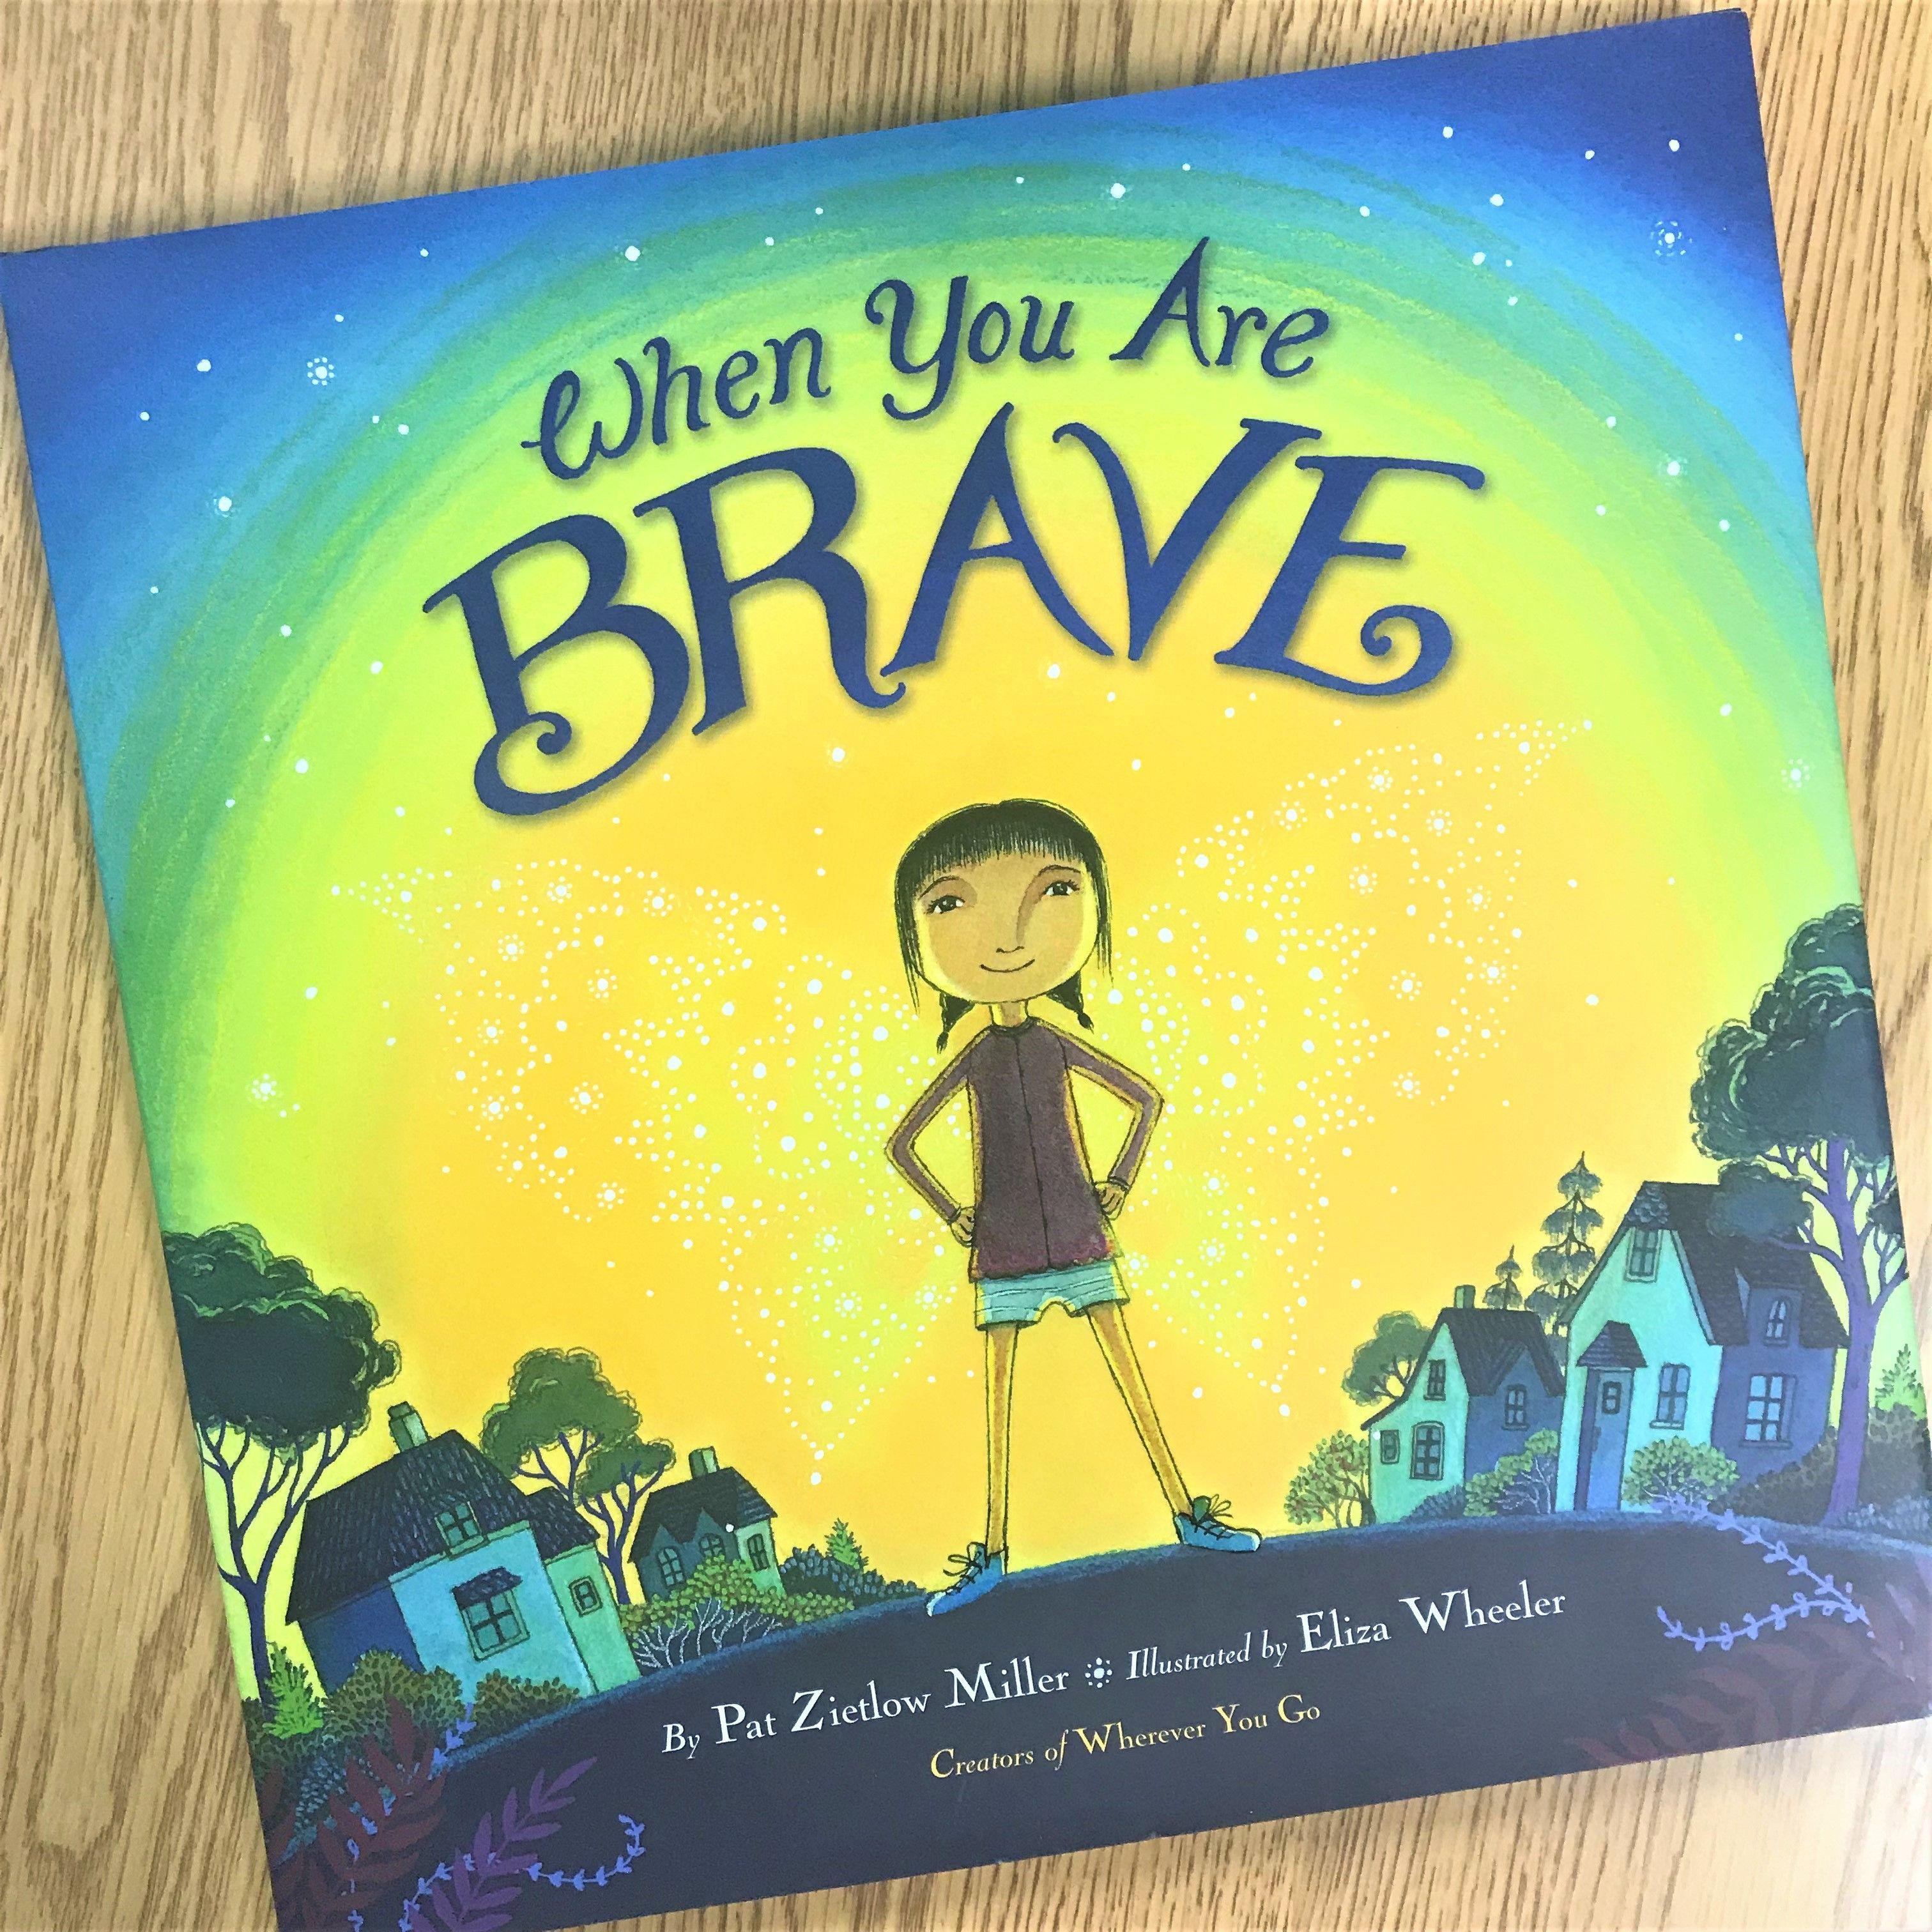 Books to teach feelings and emotions natalie lynn